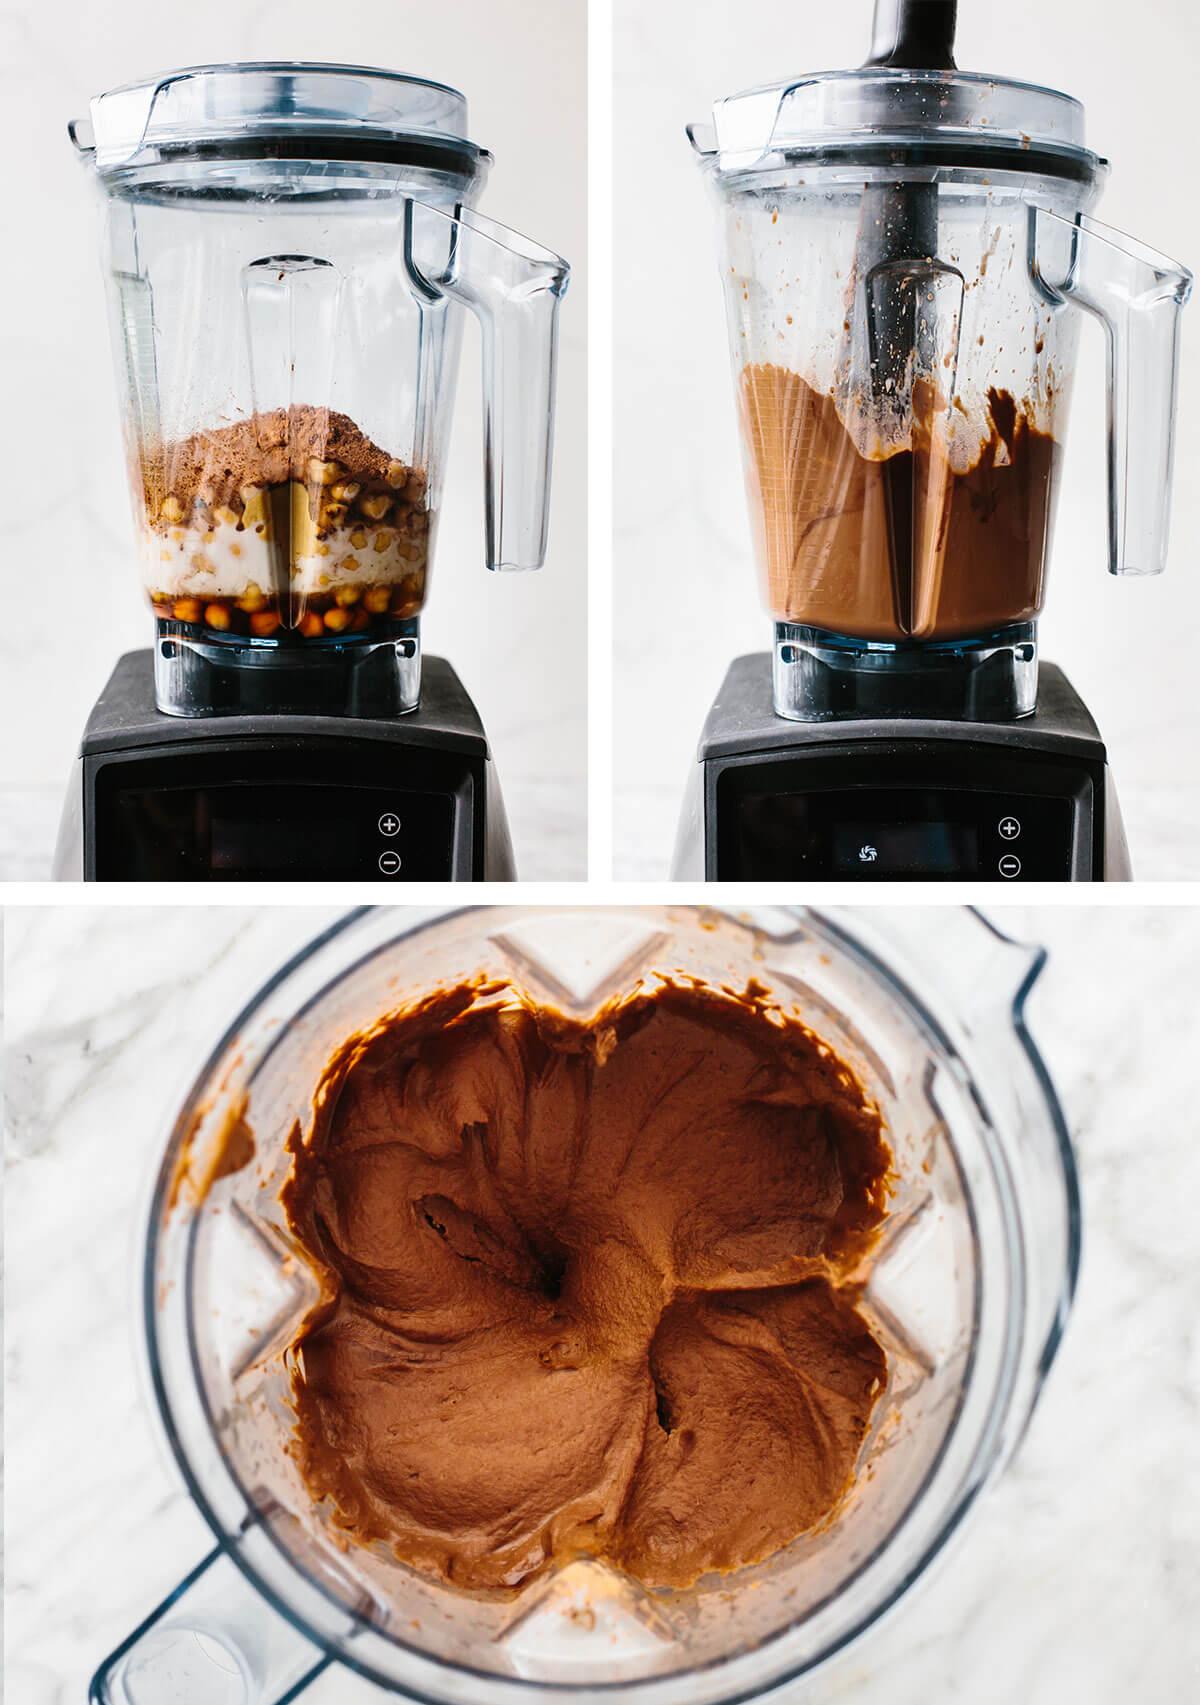 Making chocolate hummus in a Vitamix.